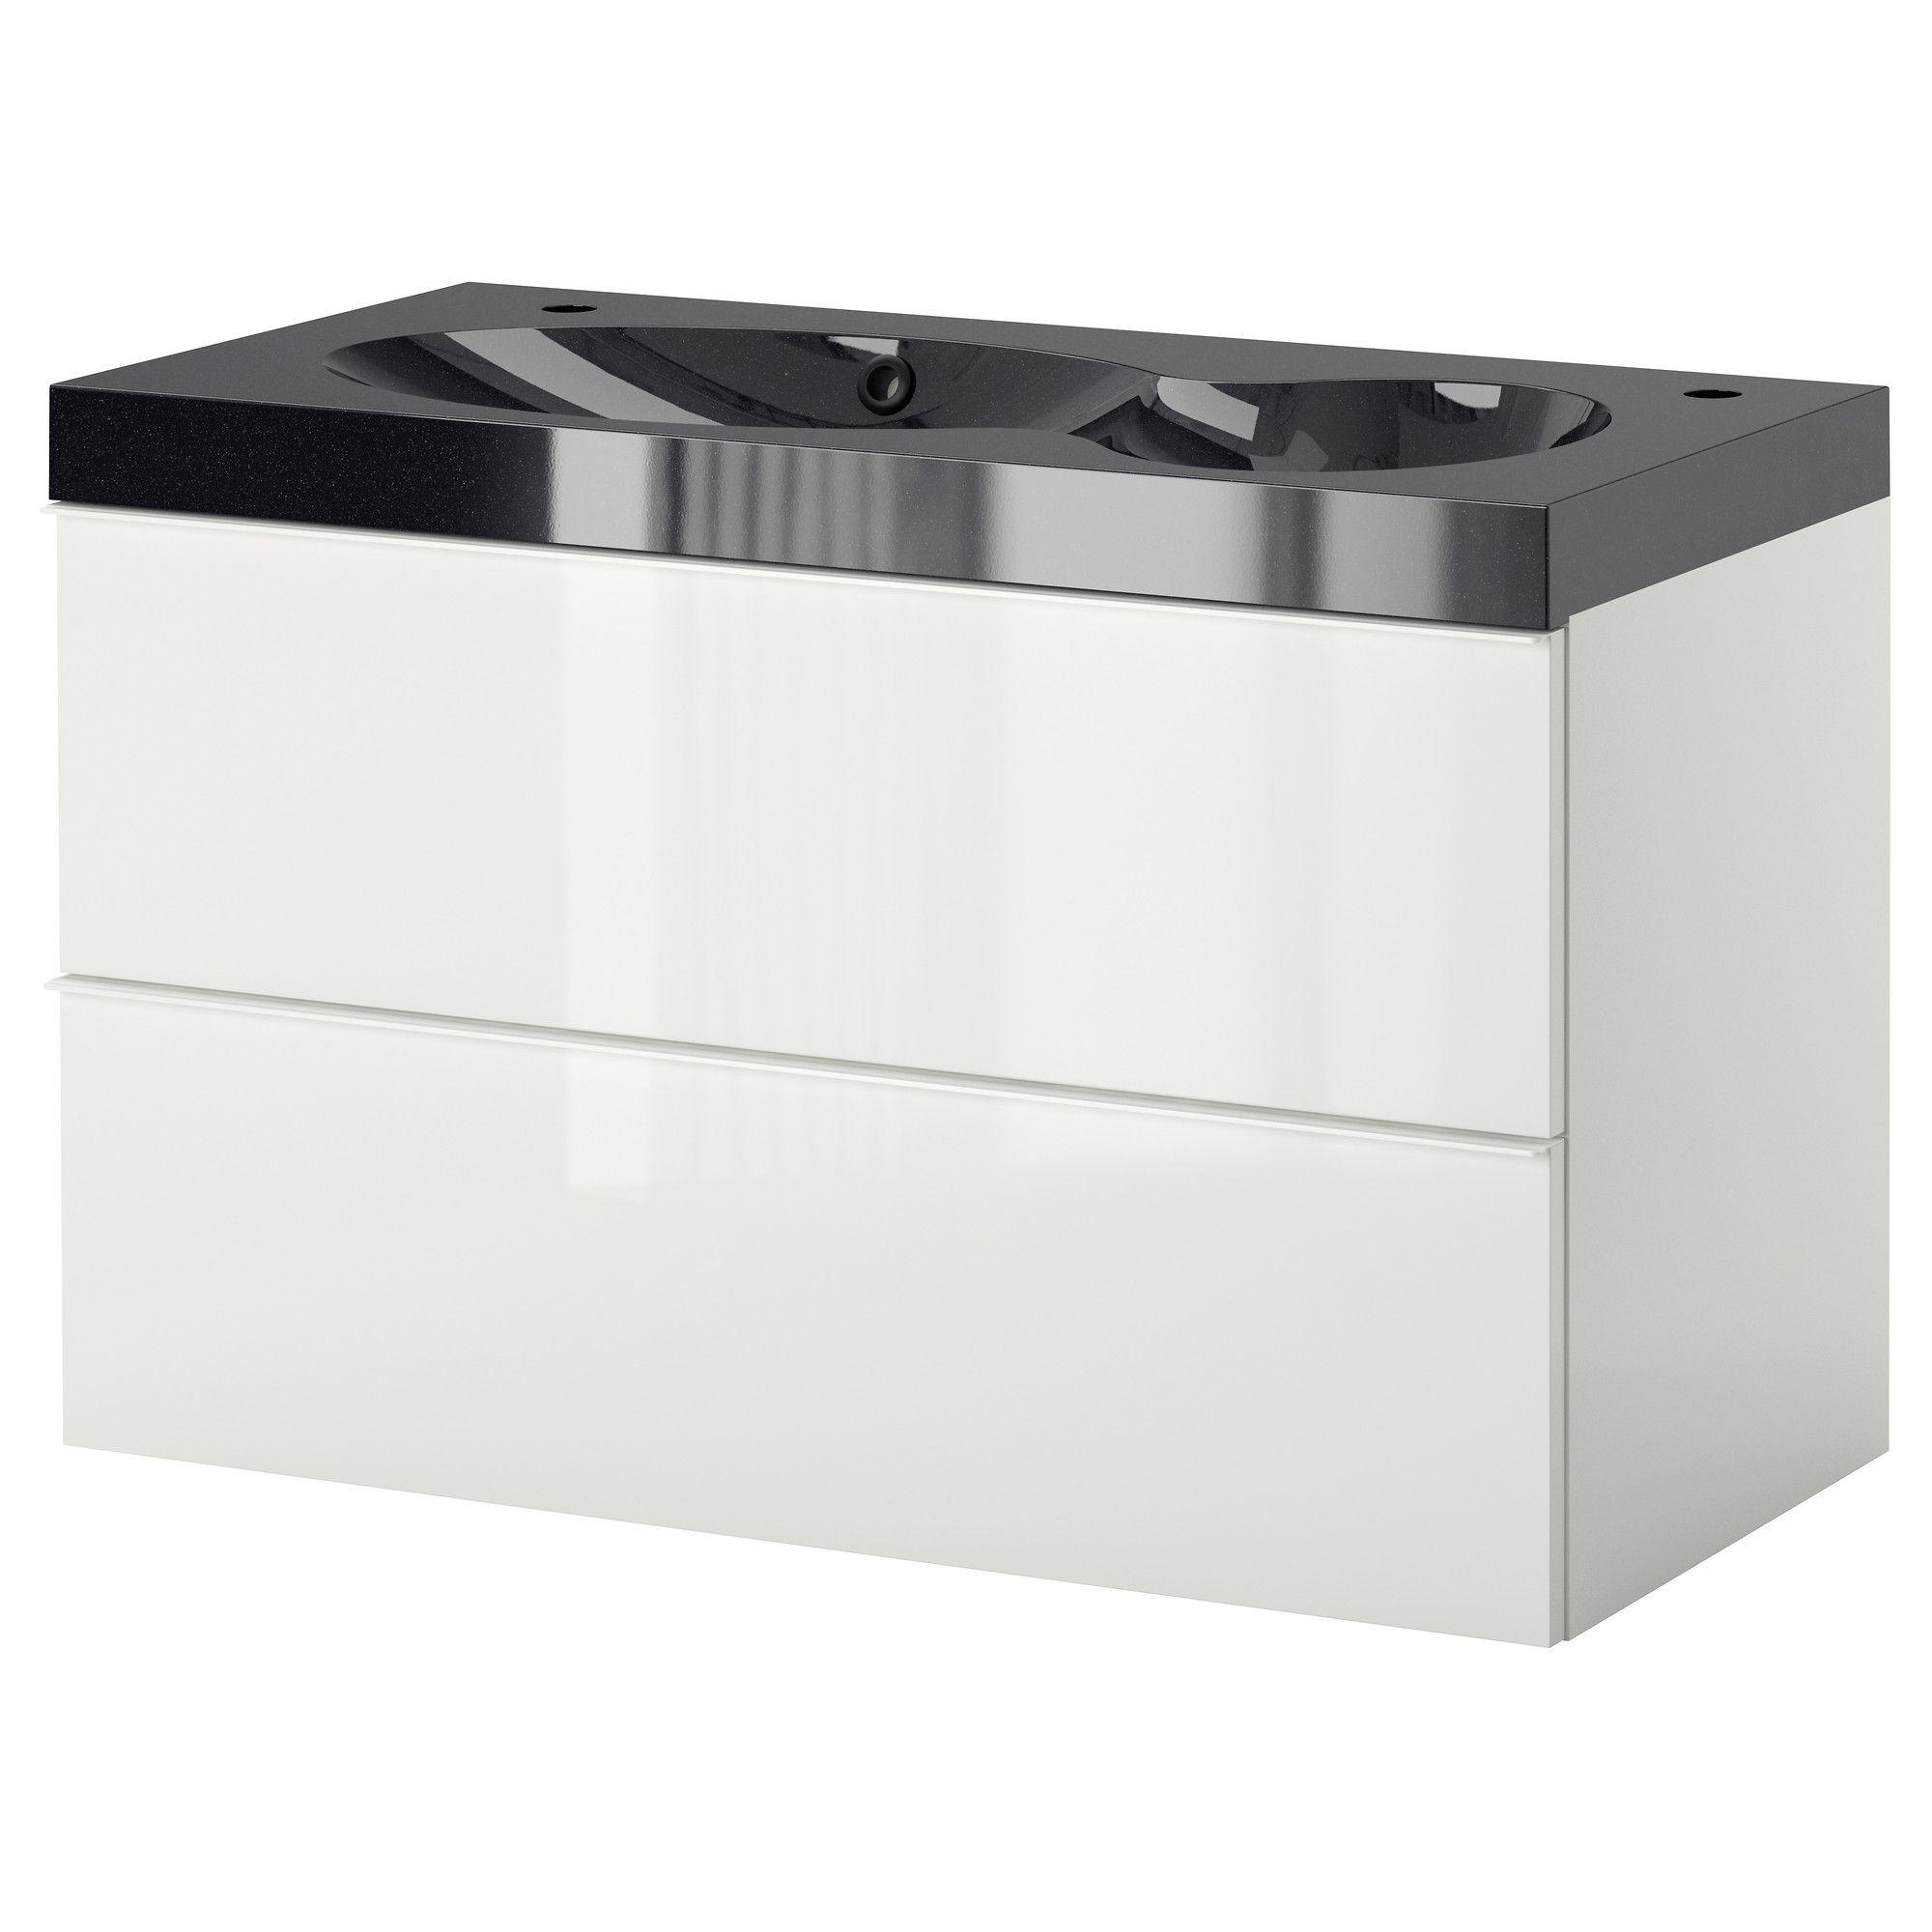 GODMORGON/BREDVIKEN Sink cabinet with 2 drawers - high gloss